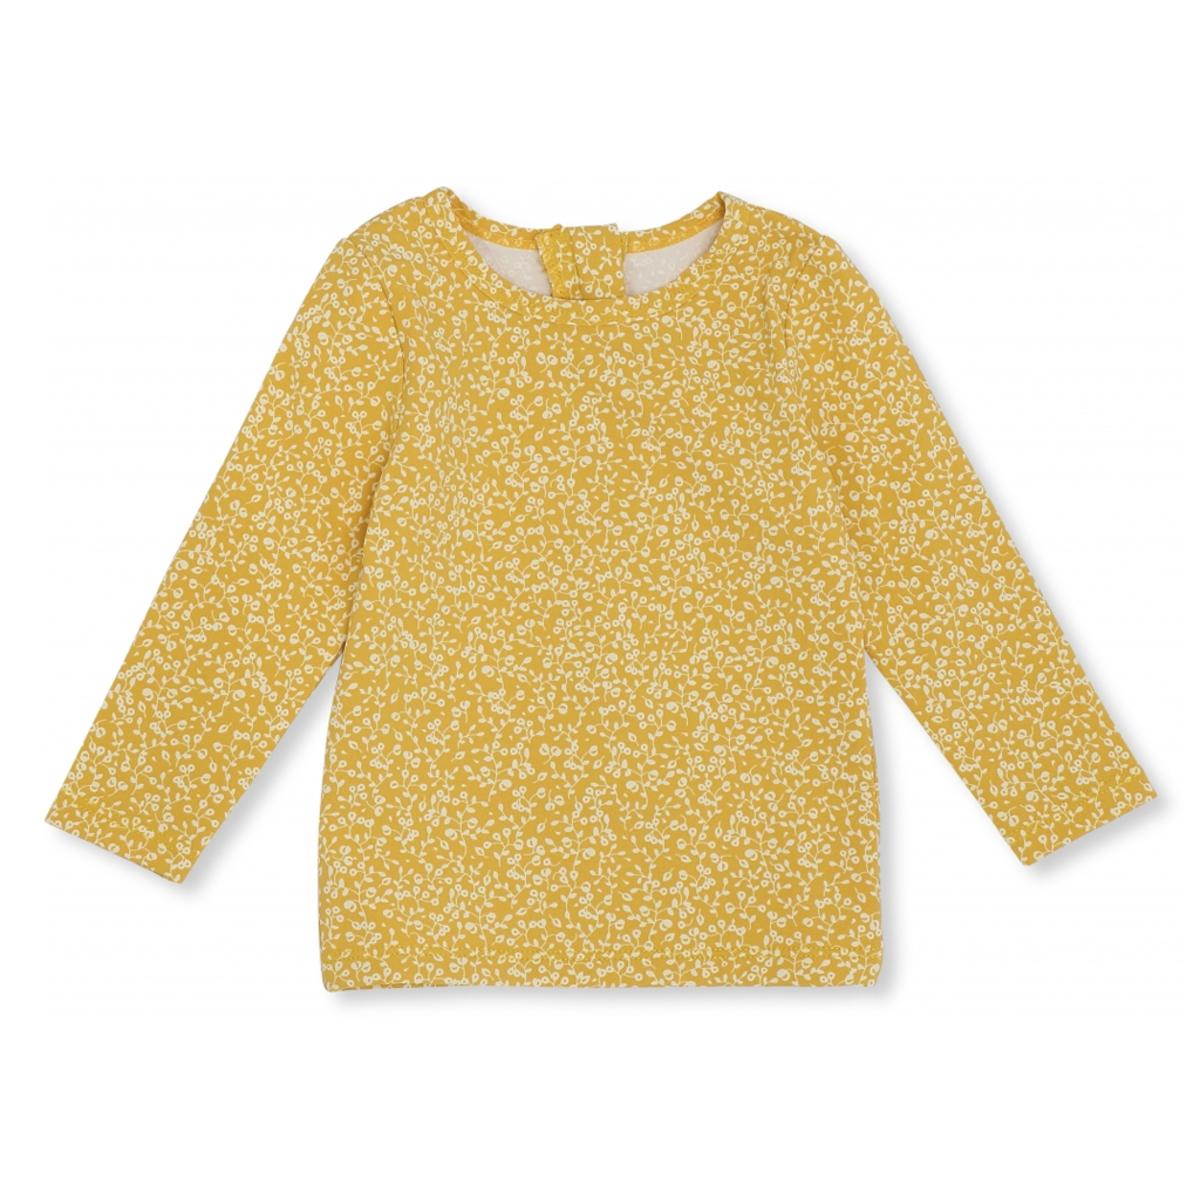 Haut bébé Tee-Shirt Anti-UV Blossom Mist - 24/36 Mois Tee-Shirt Anti-UV Blossom Mist - 24/36 Mois